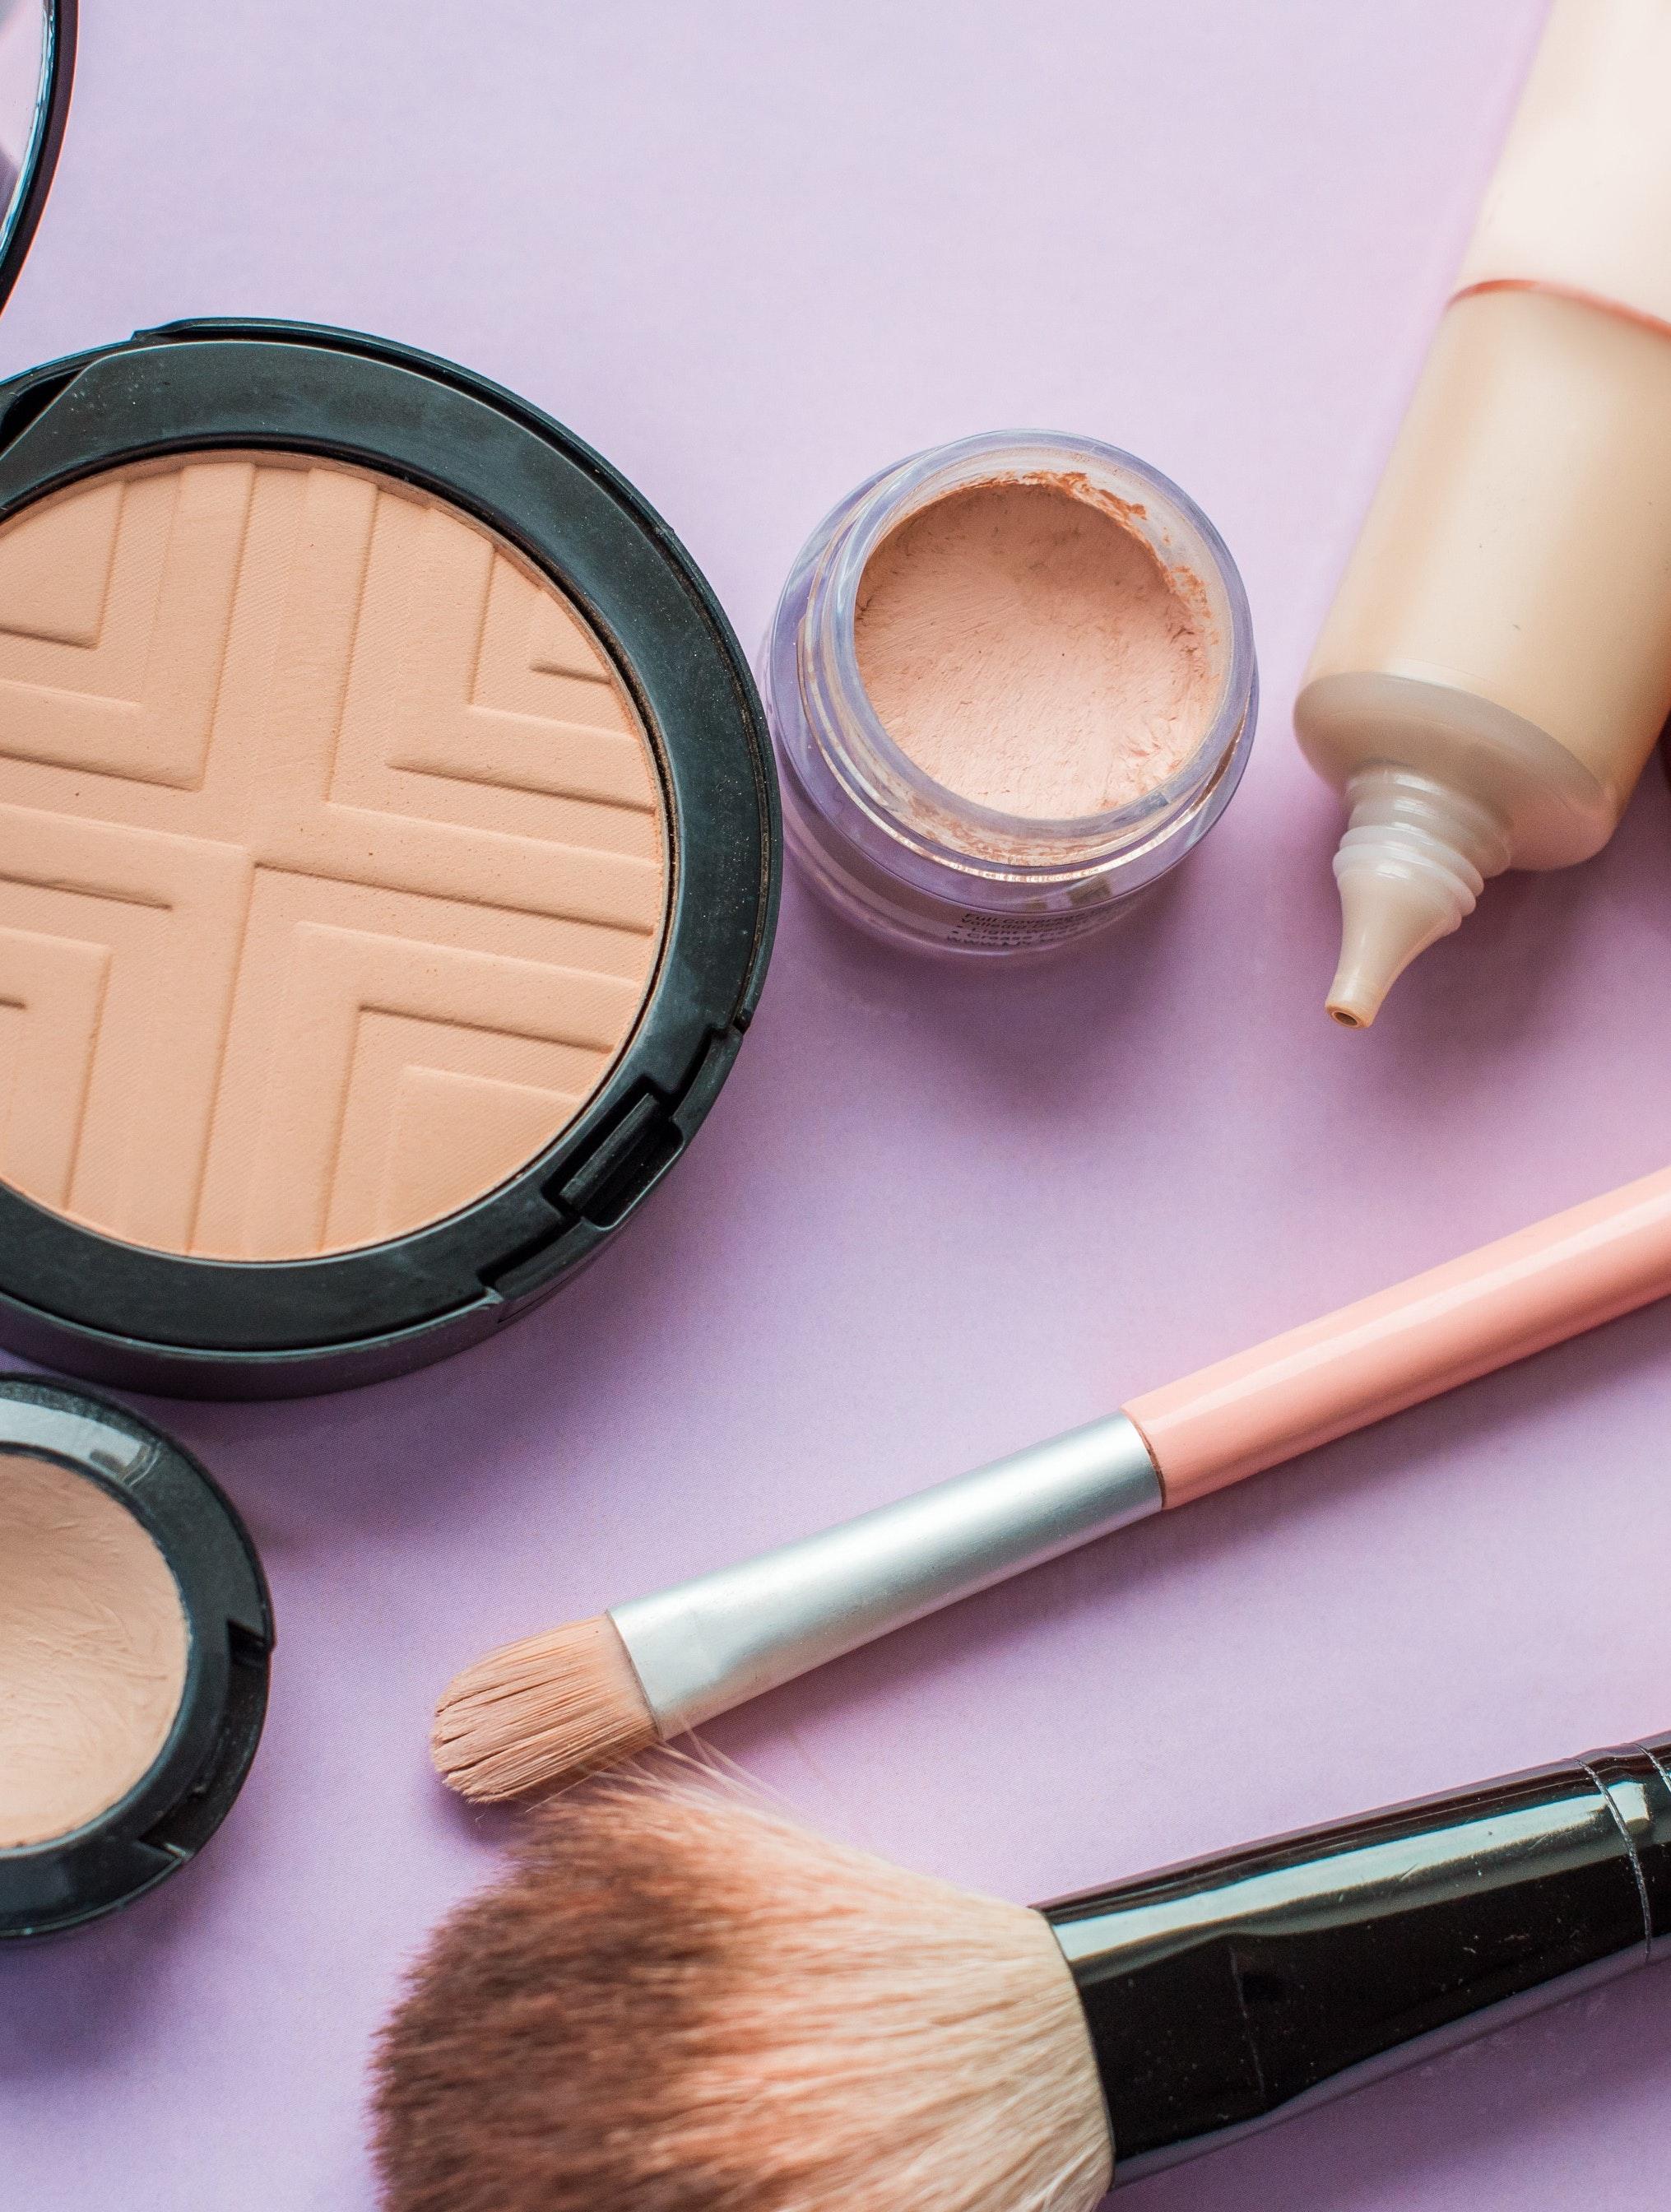 Her er den vilde makeup-trend fra TikTok, alle taler om